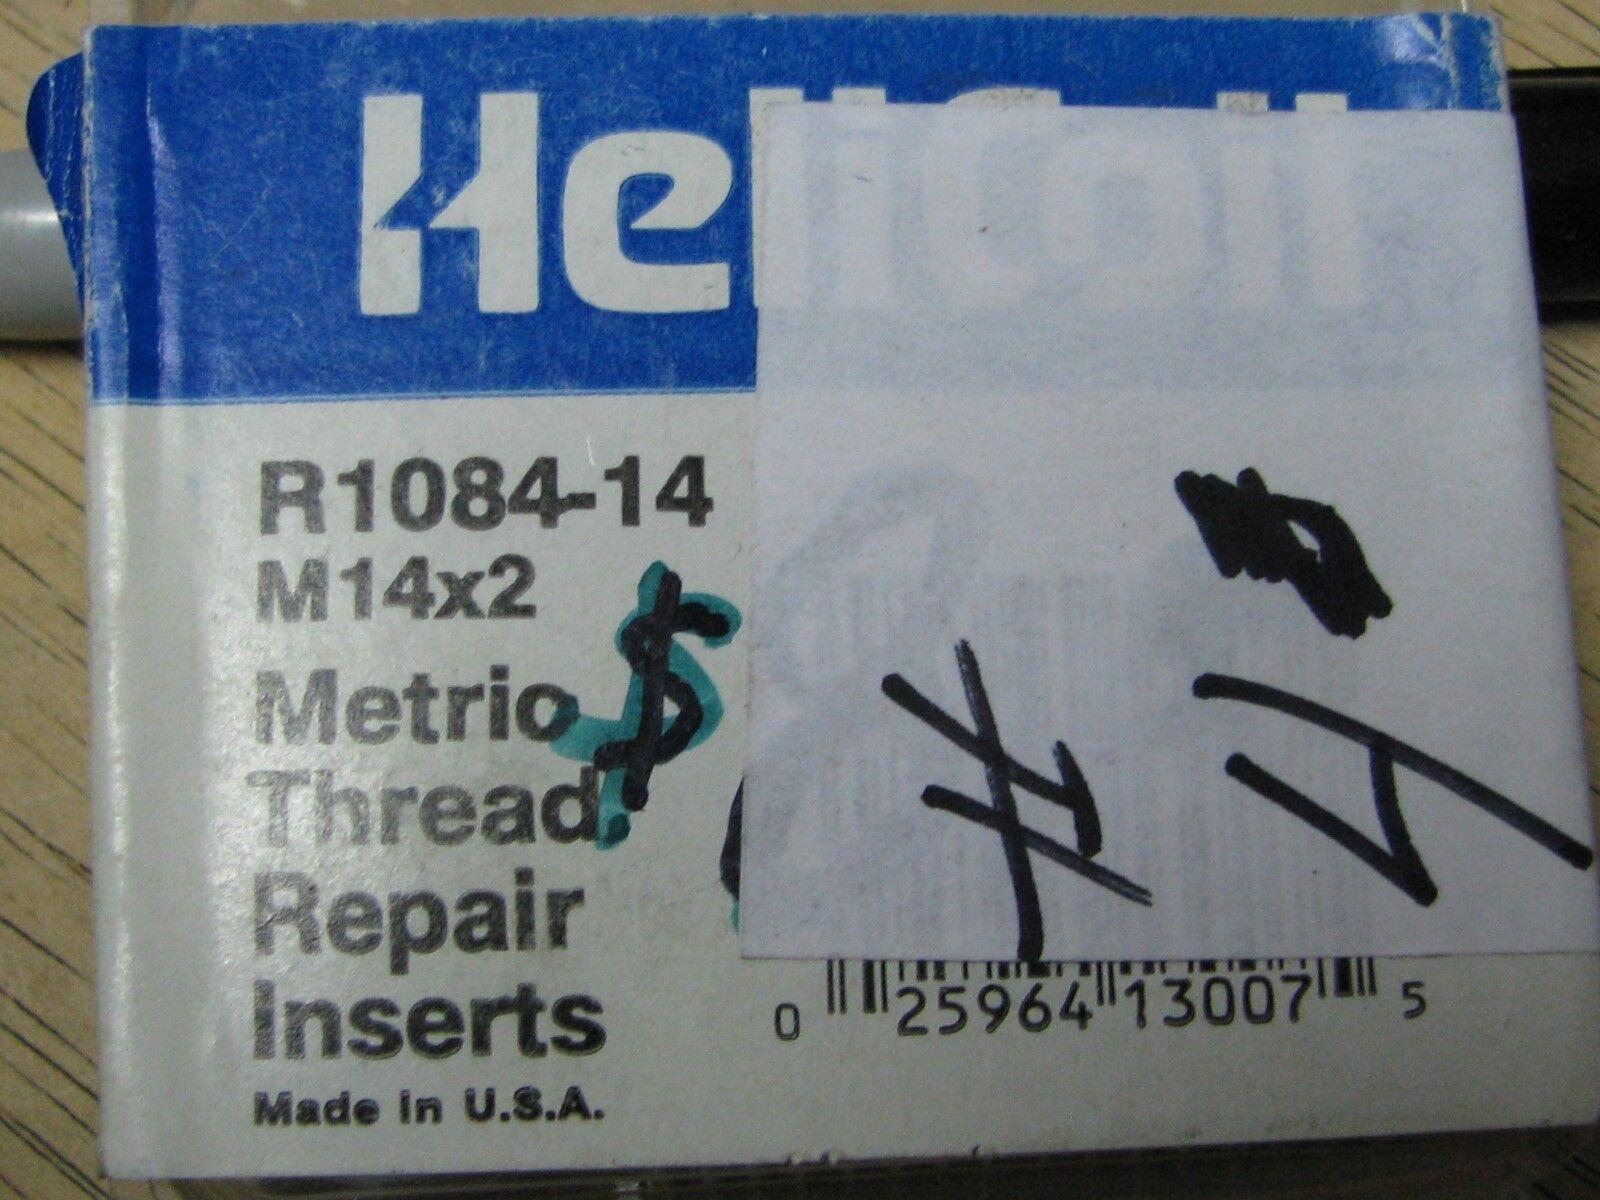 304SS Helical Insert PK6 M14x2